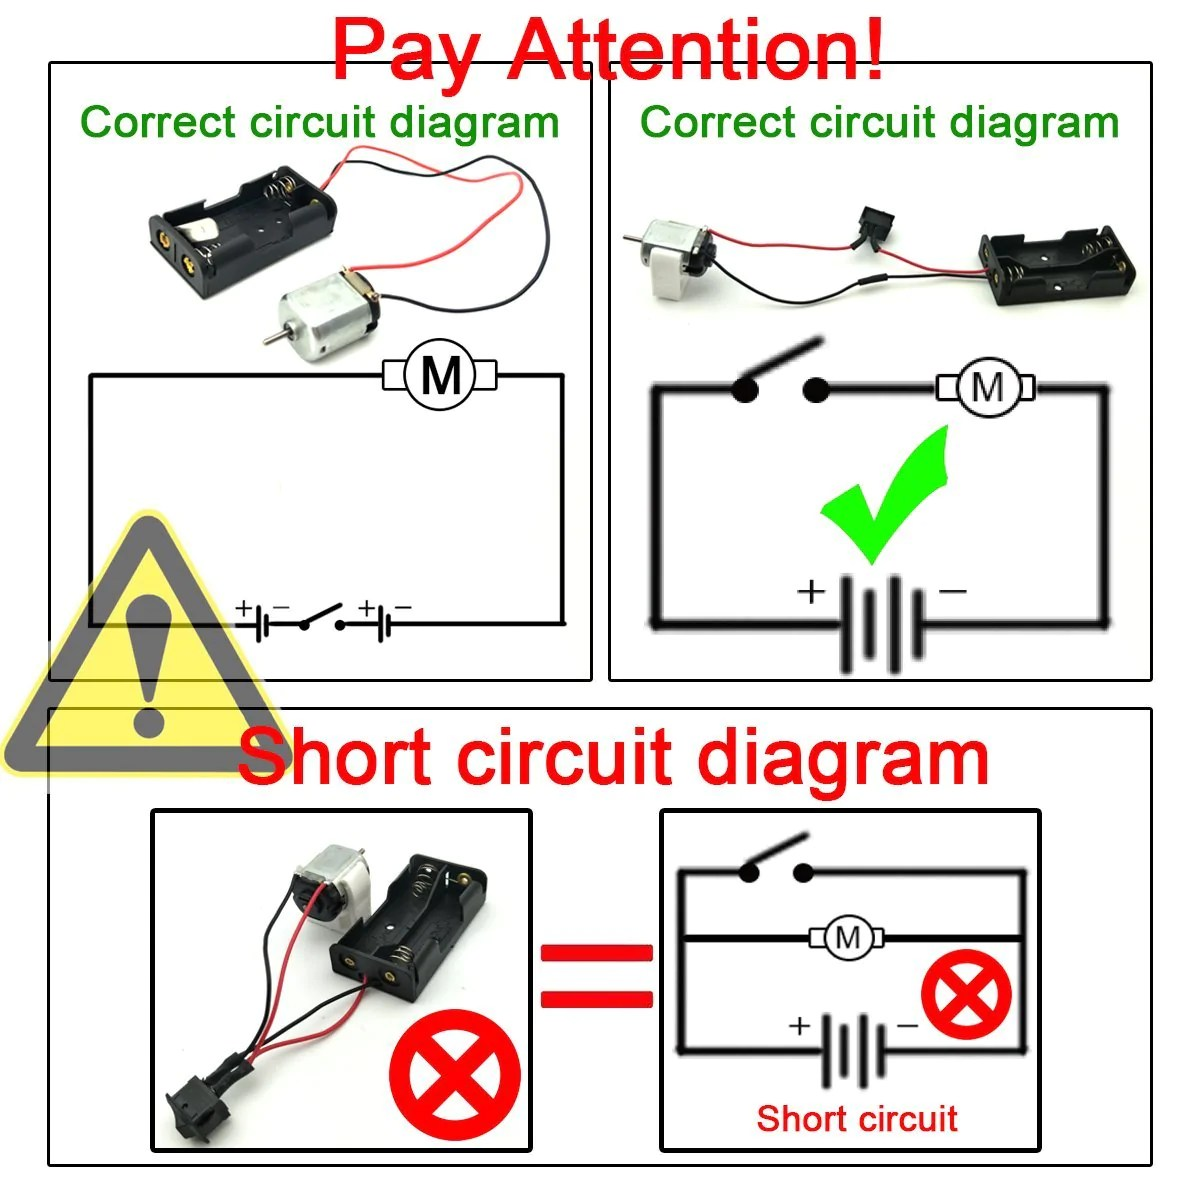 medium resolution of  eudax 6 set small dc motor mini electric hobby motors 1 5v 3v 15000rpm with